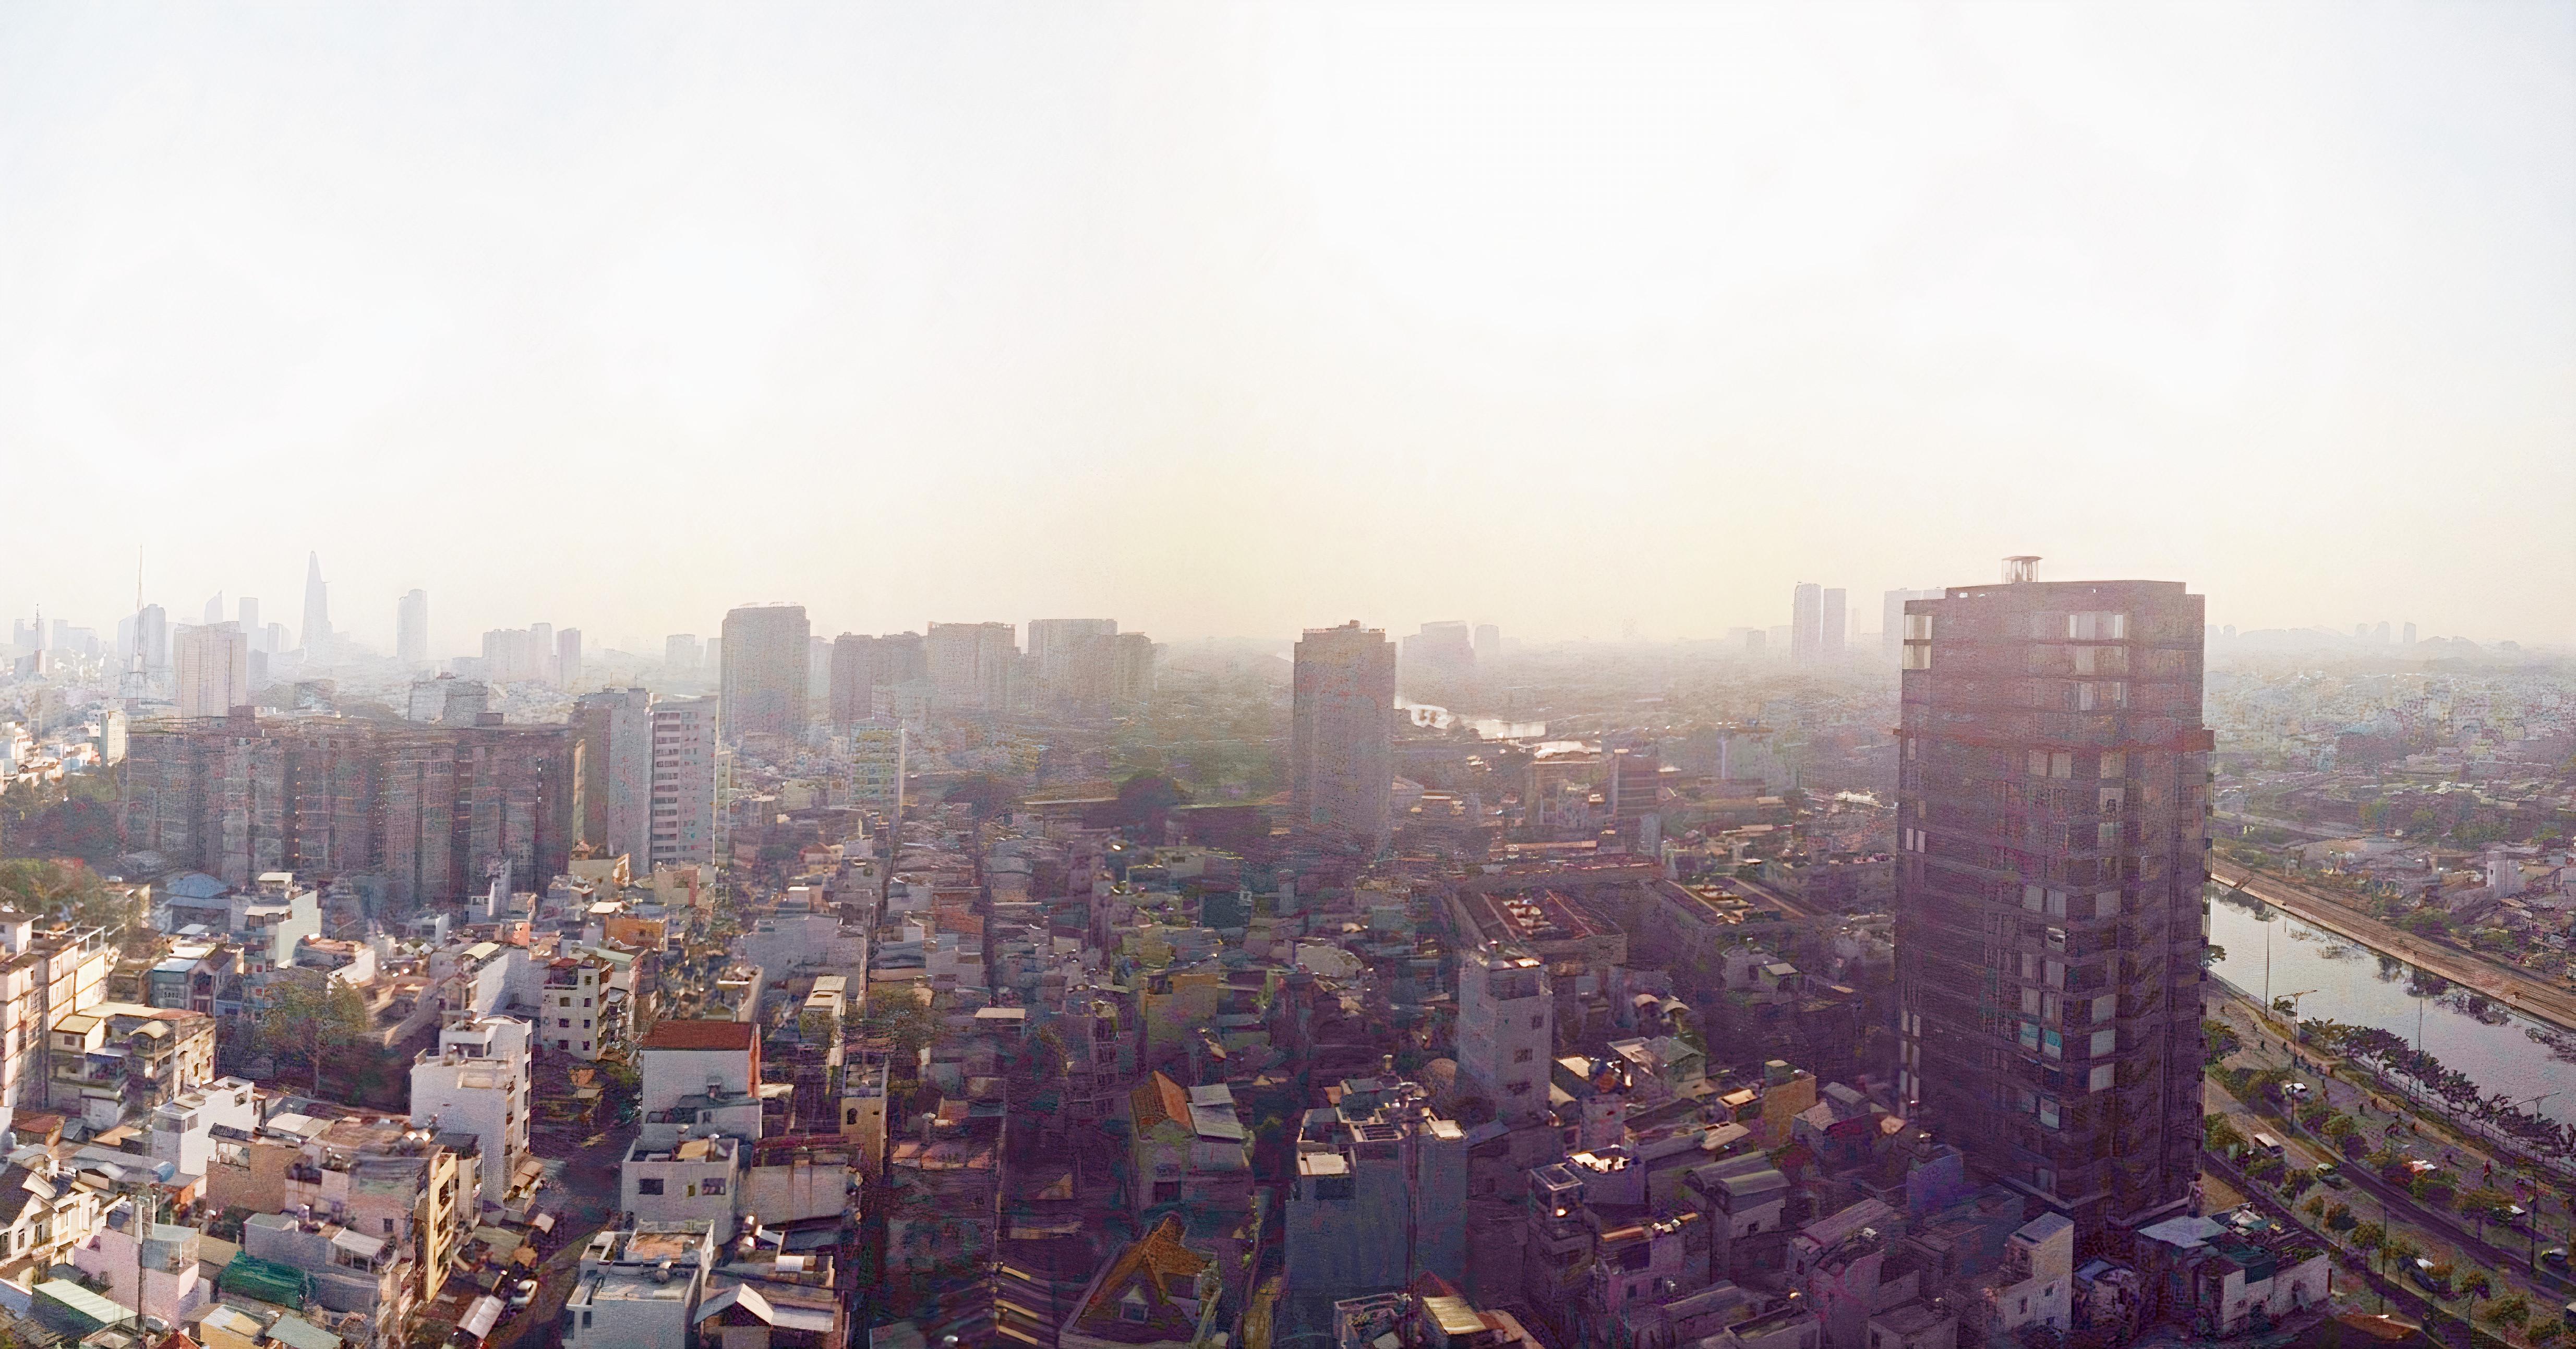 rent, apartment rent, Vietnam, Hochiminh, airbnb, аренда, аренда апартаментов, Вьетнам, Хошимин